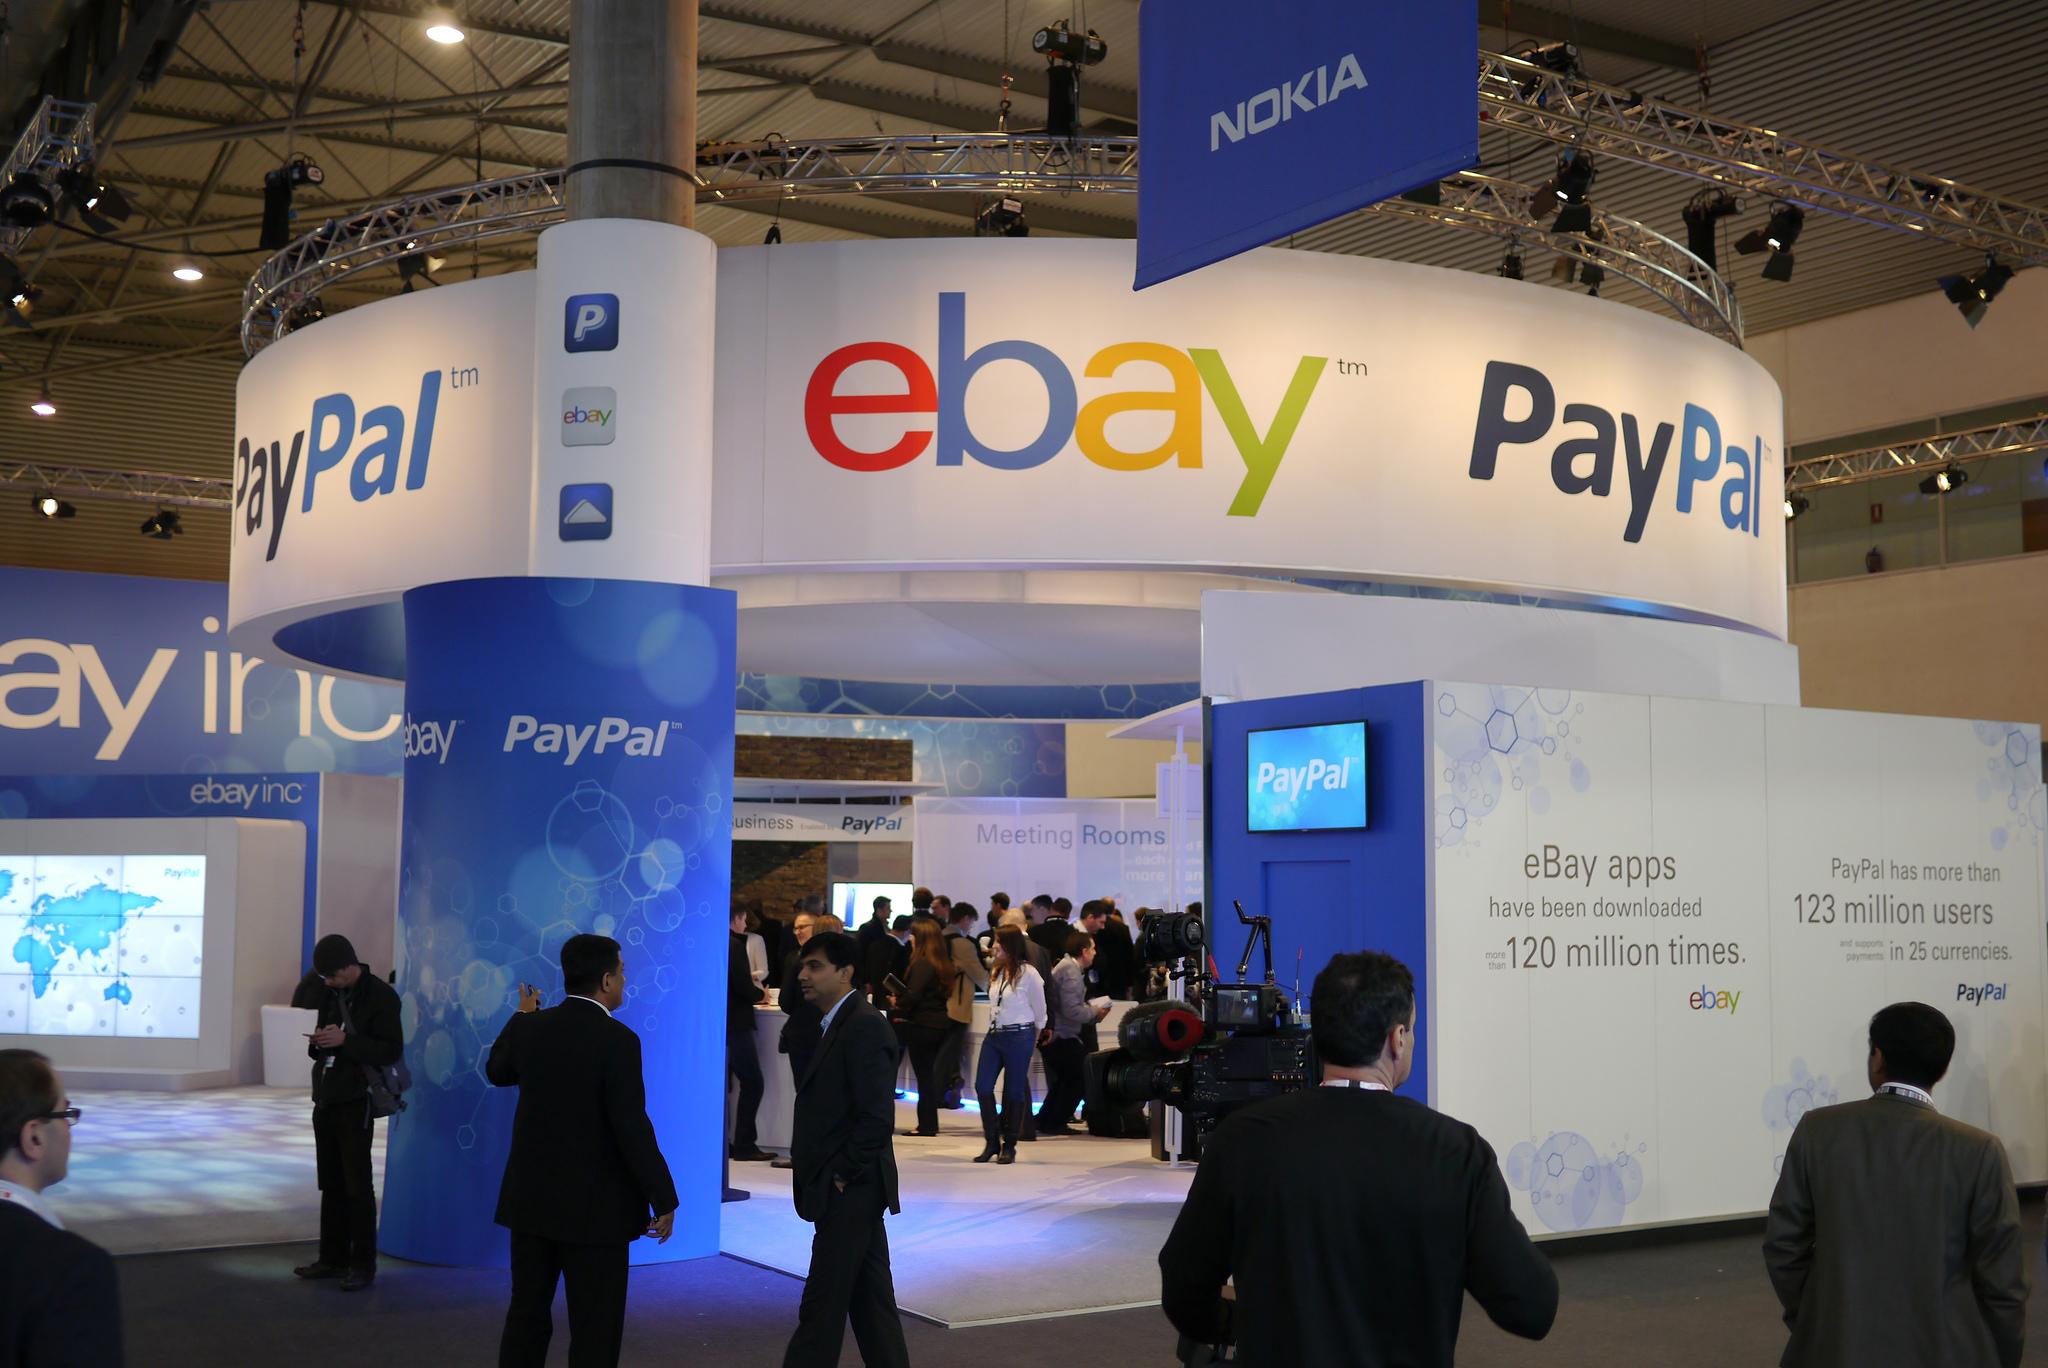 MWC Barcelona 2013 - eBay, Paypal, Kārlis Dambrāns February 25, 2013c